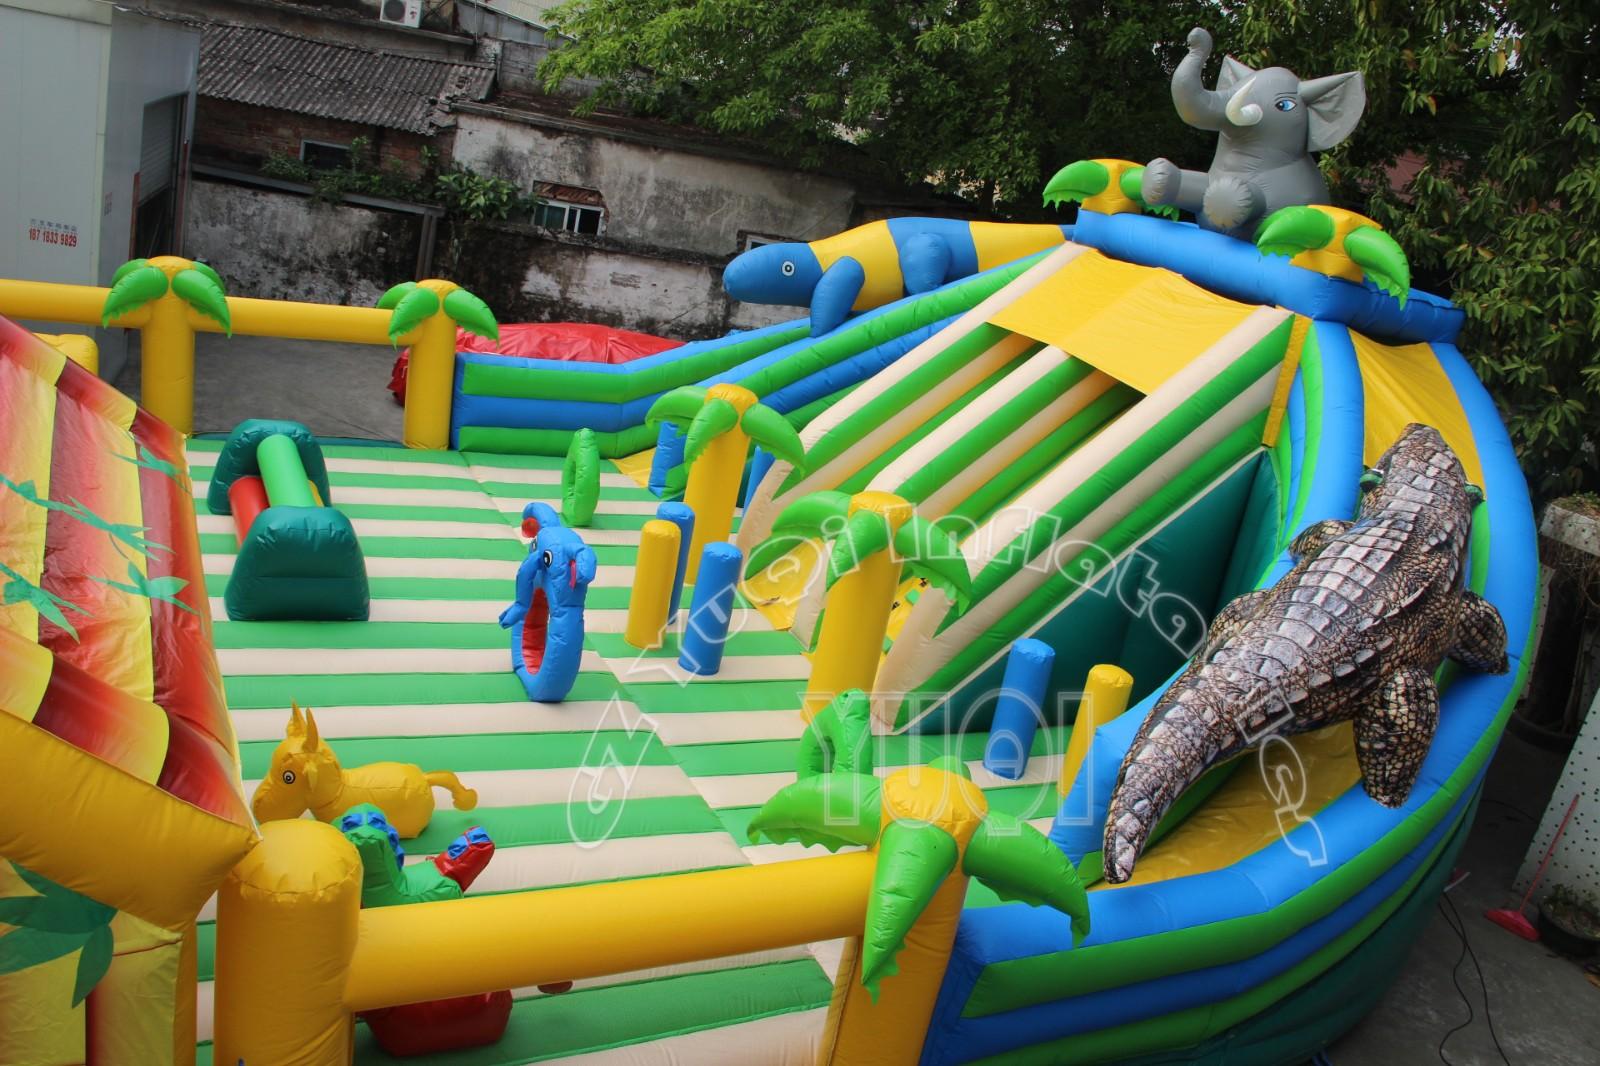 YUQI-Best Yq615 Giant Interesting Indoor Inflatable Amusement Park